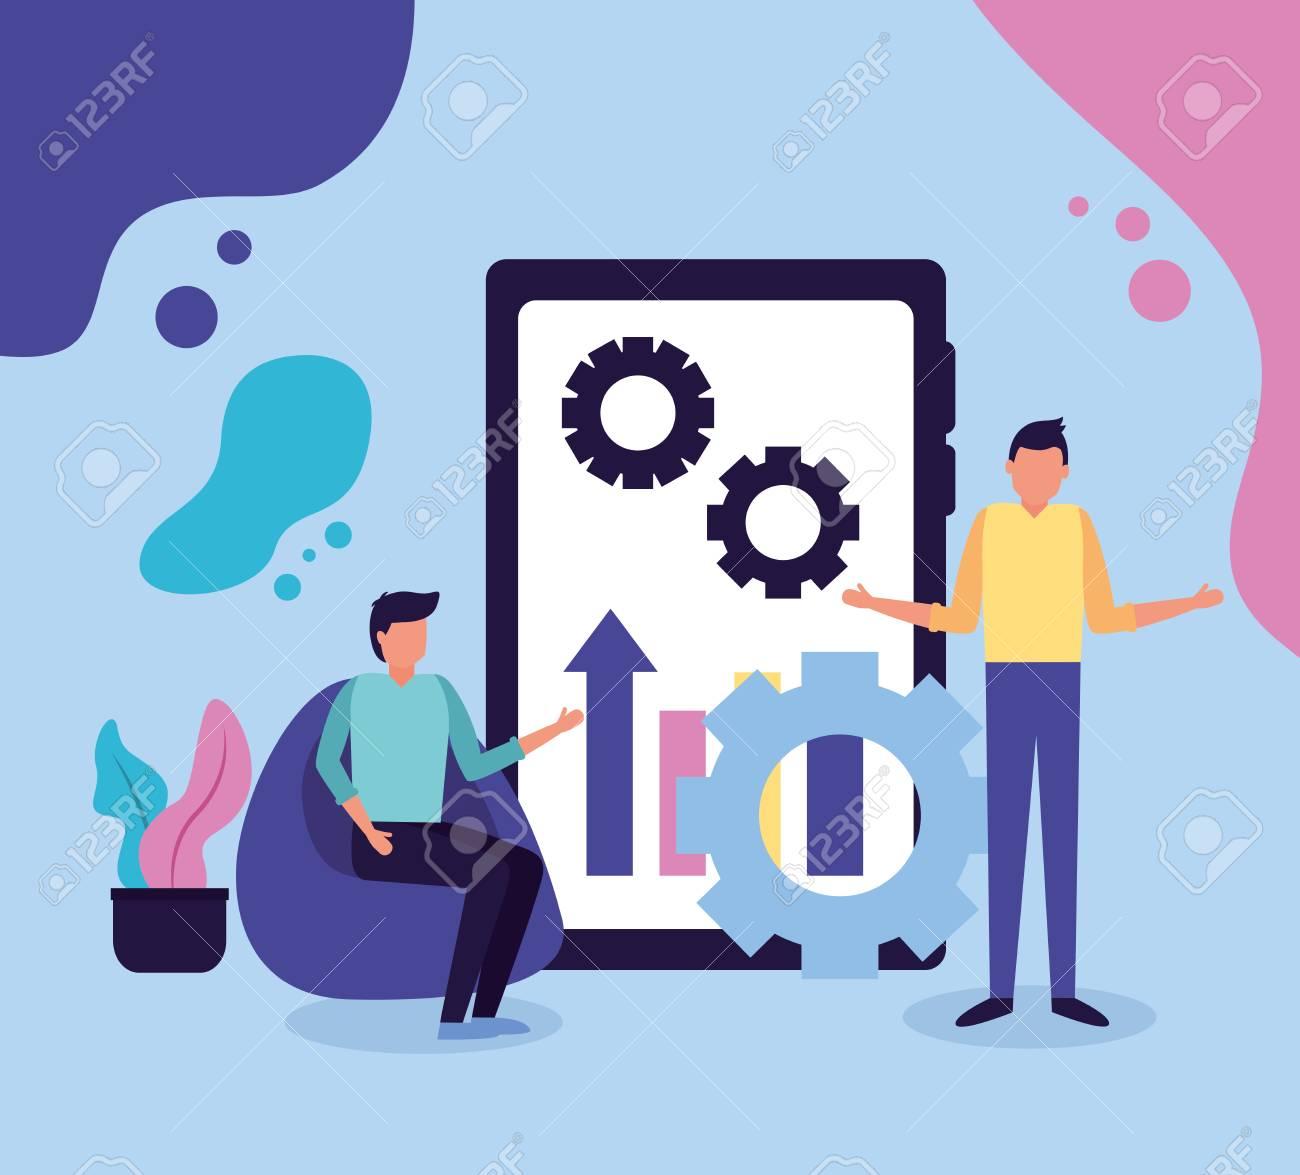 two men mobile chart gear business work vector illustration - 124741070